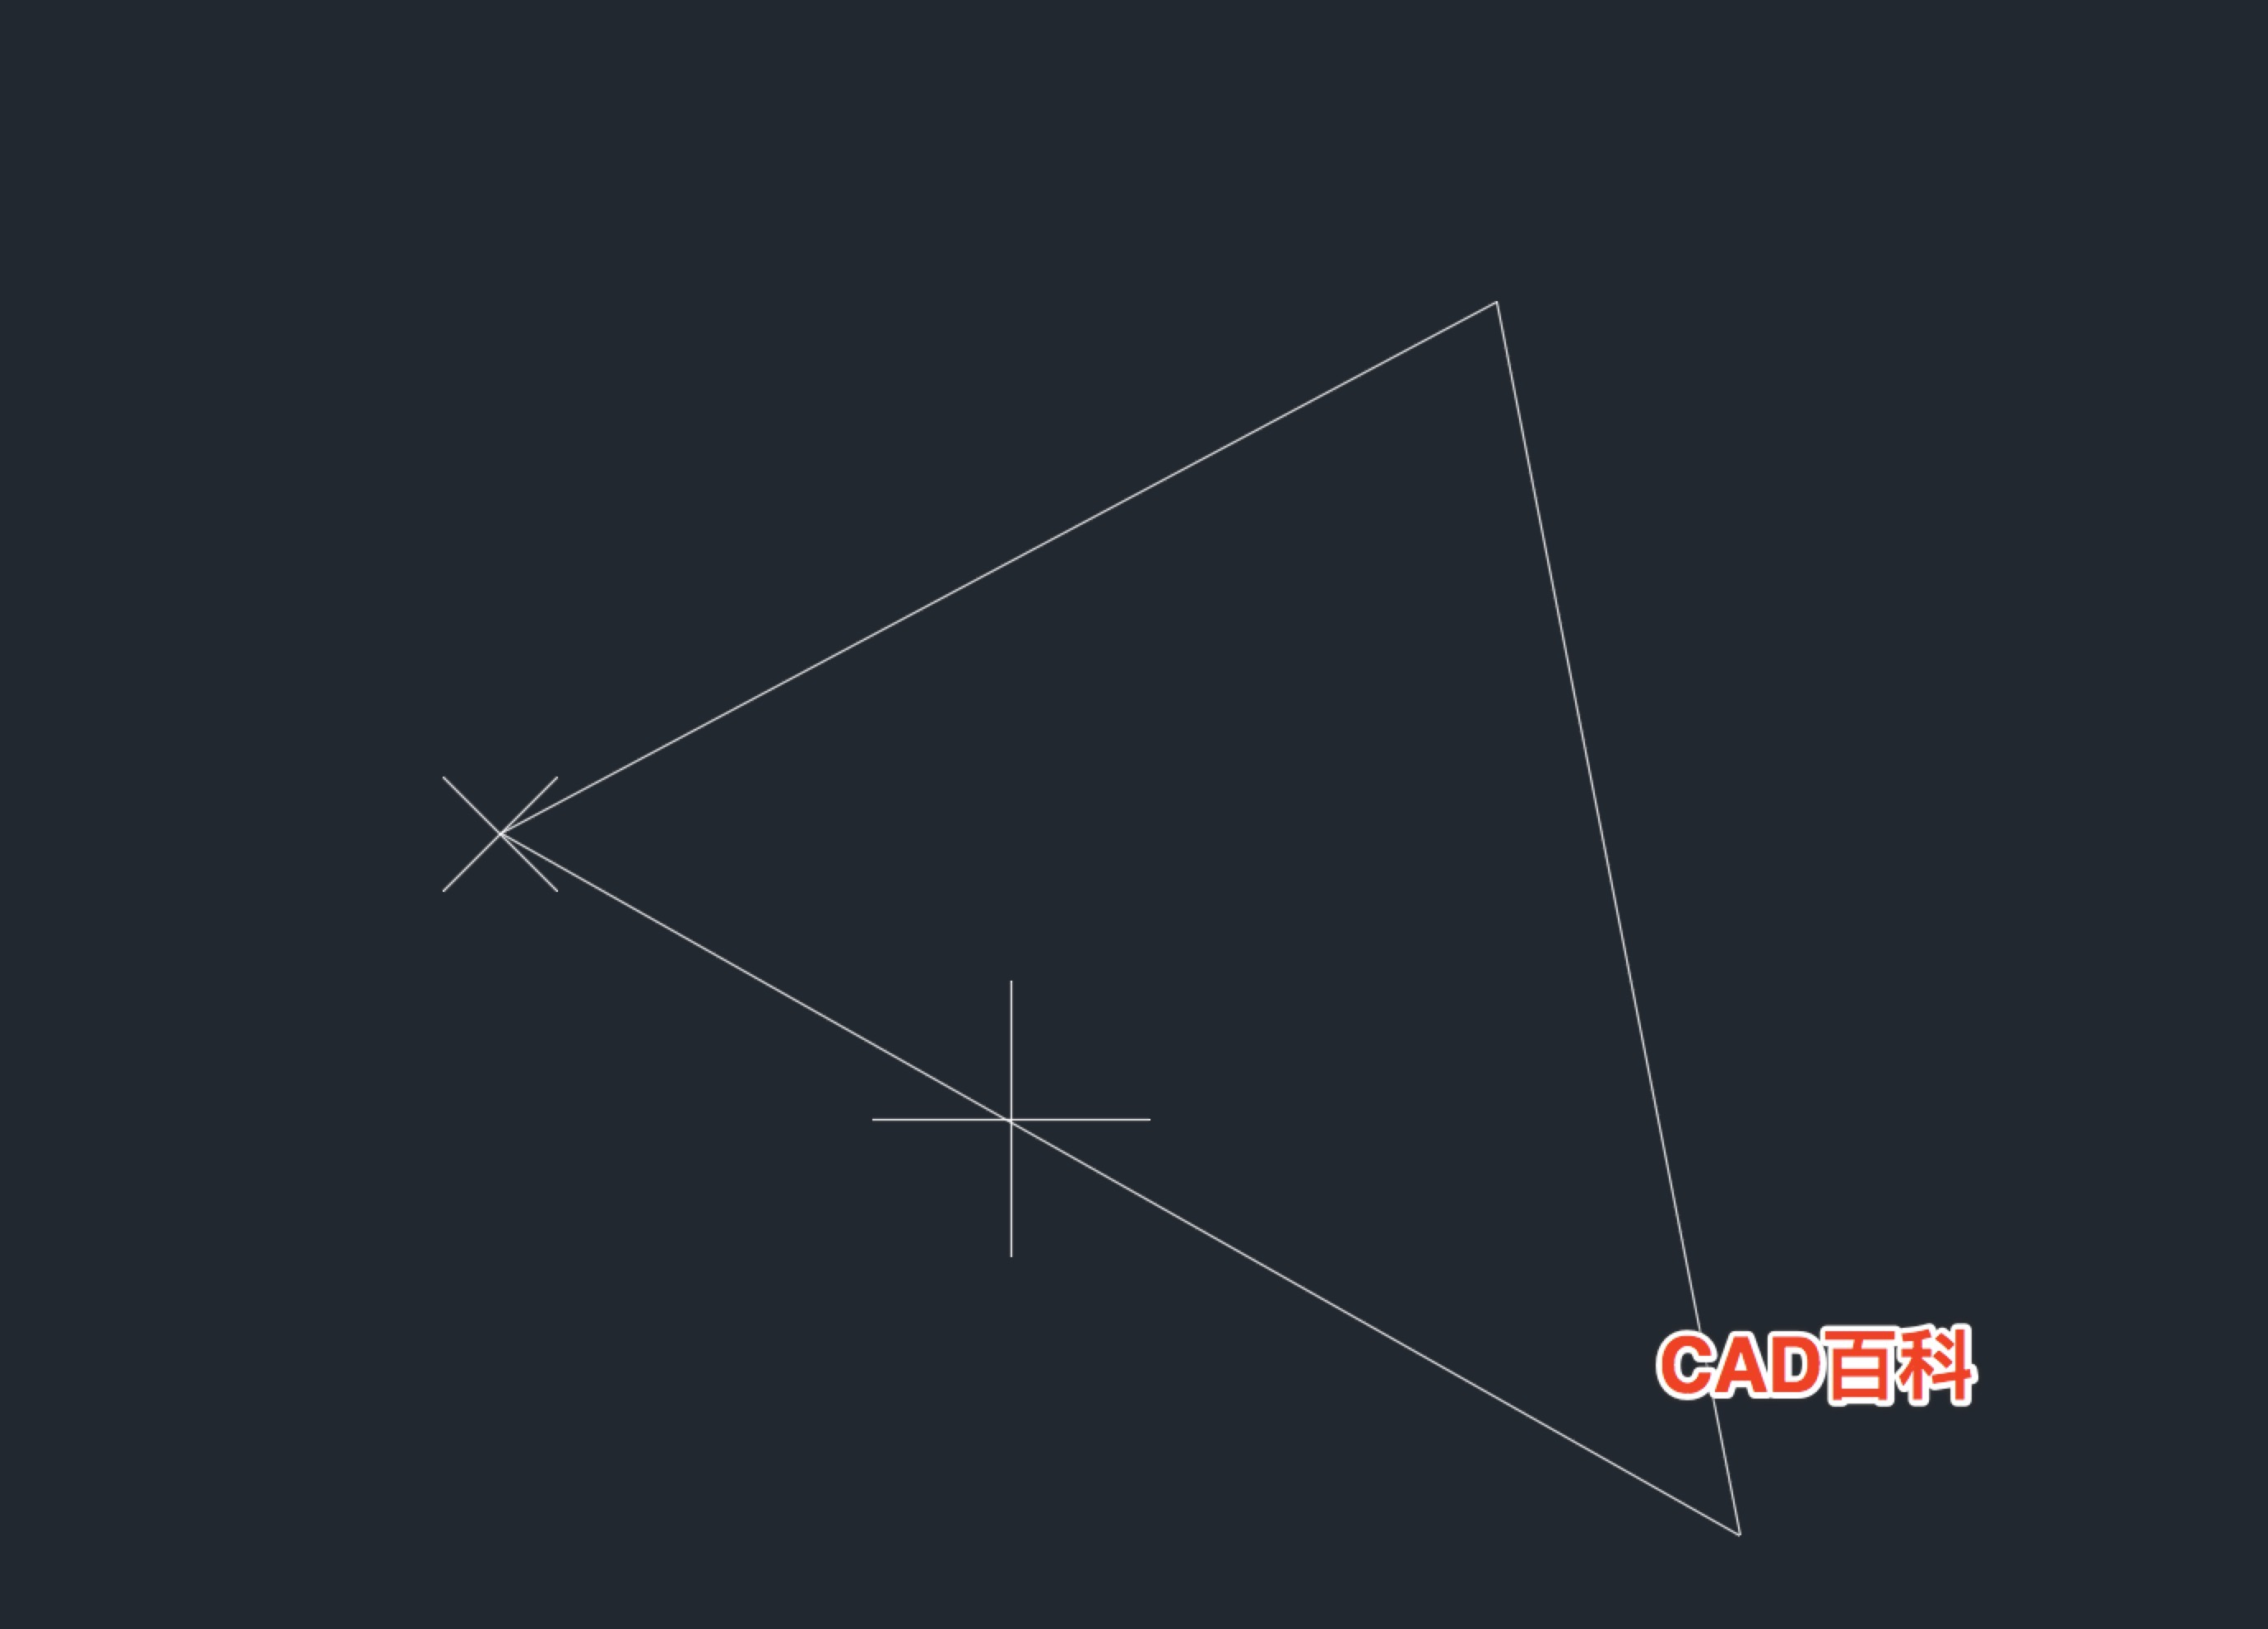 CAD多段线增加节点(在一条线上增加节点的方法)